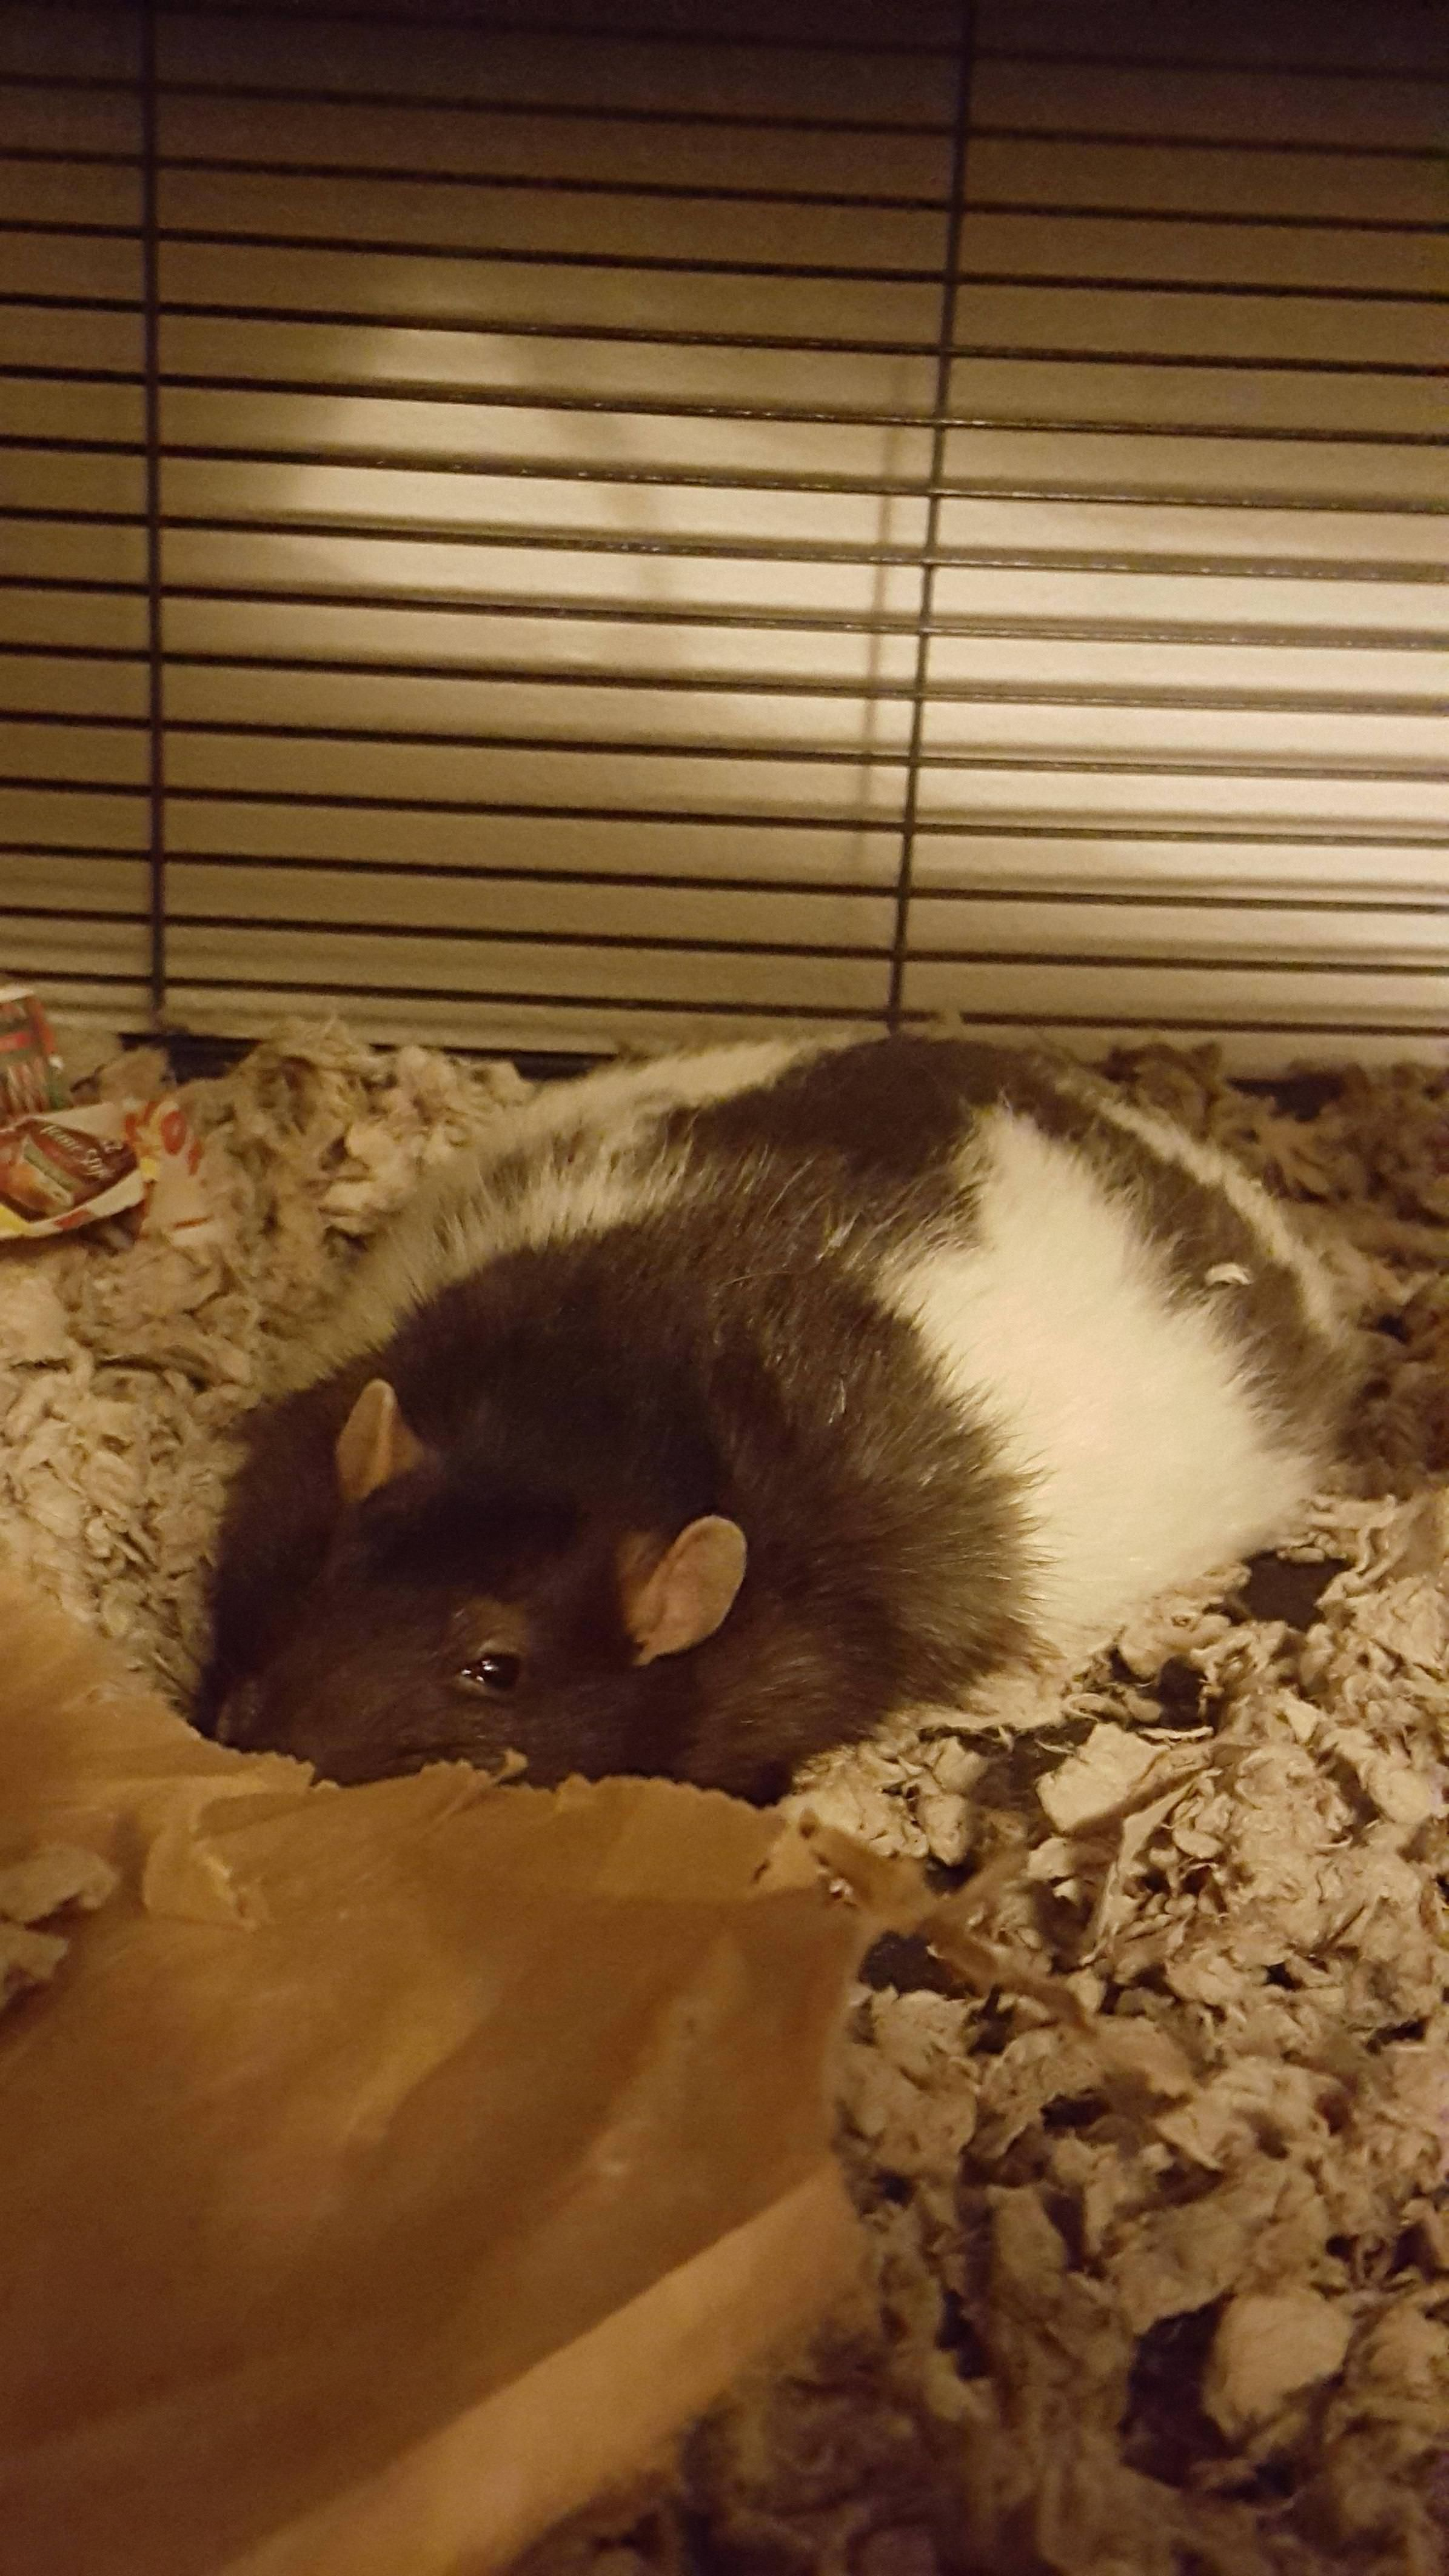 Meet Our Flat Rat Oscar Aww Cute Rat Cuterats Ratsofpinterest Cuddle Fluffy Animals Pets Bestfriend Ittssofluffy Cute Rats Small Pets Fancy Rat